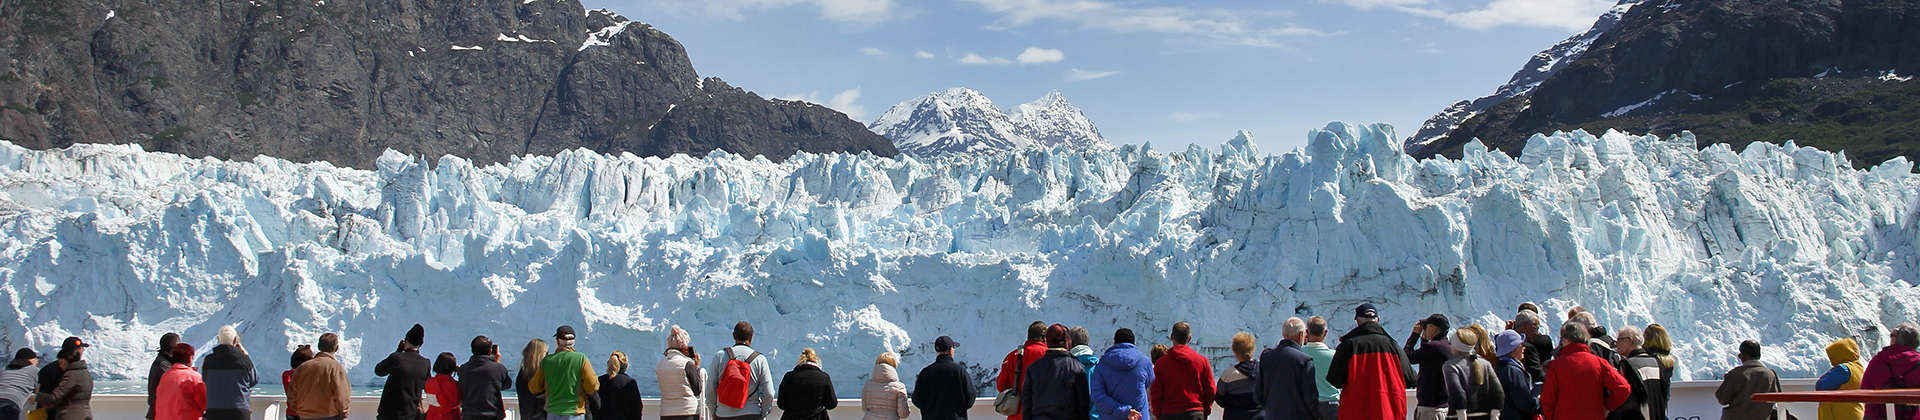 header-alaska-or-antarctica-1920x420